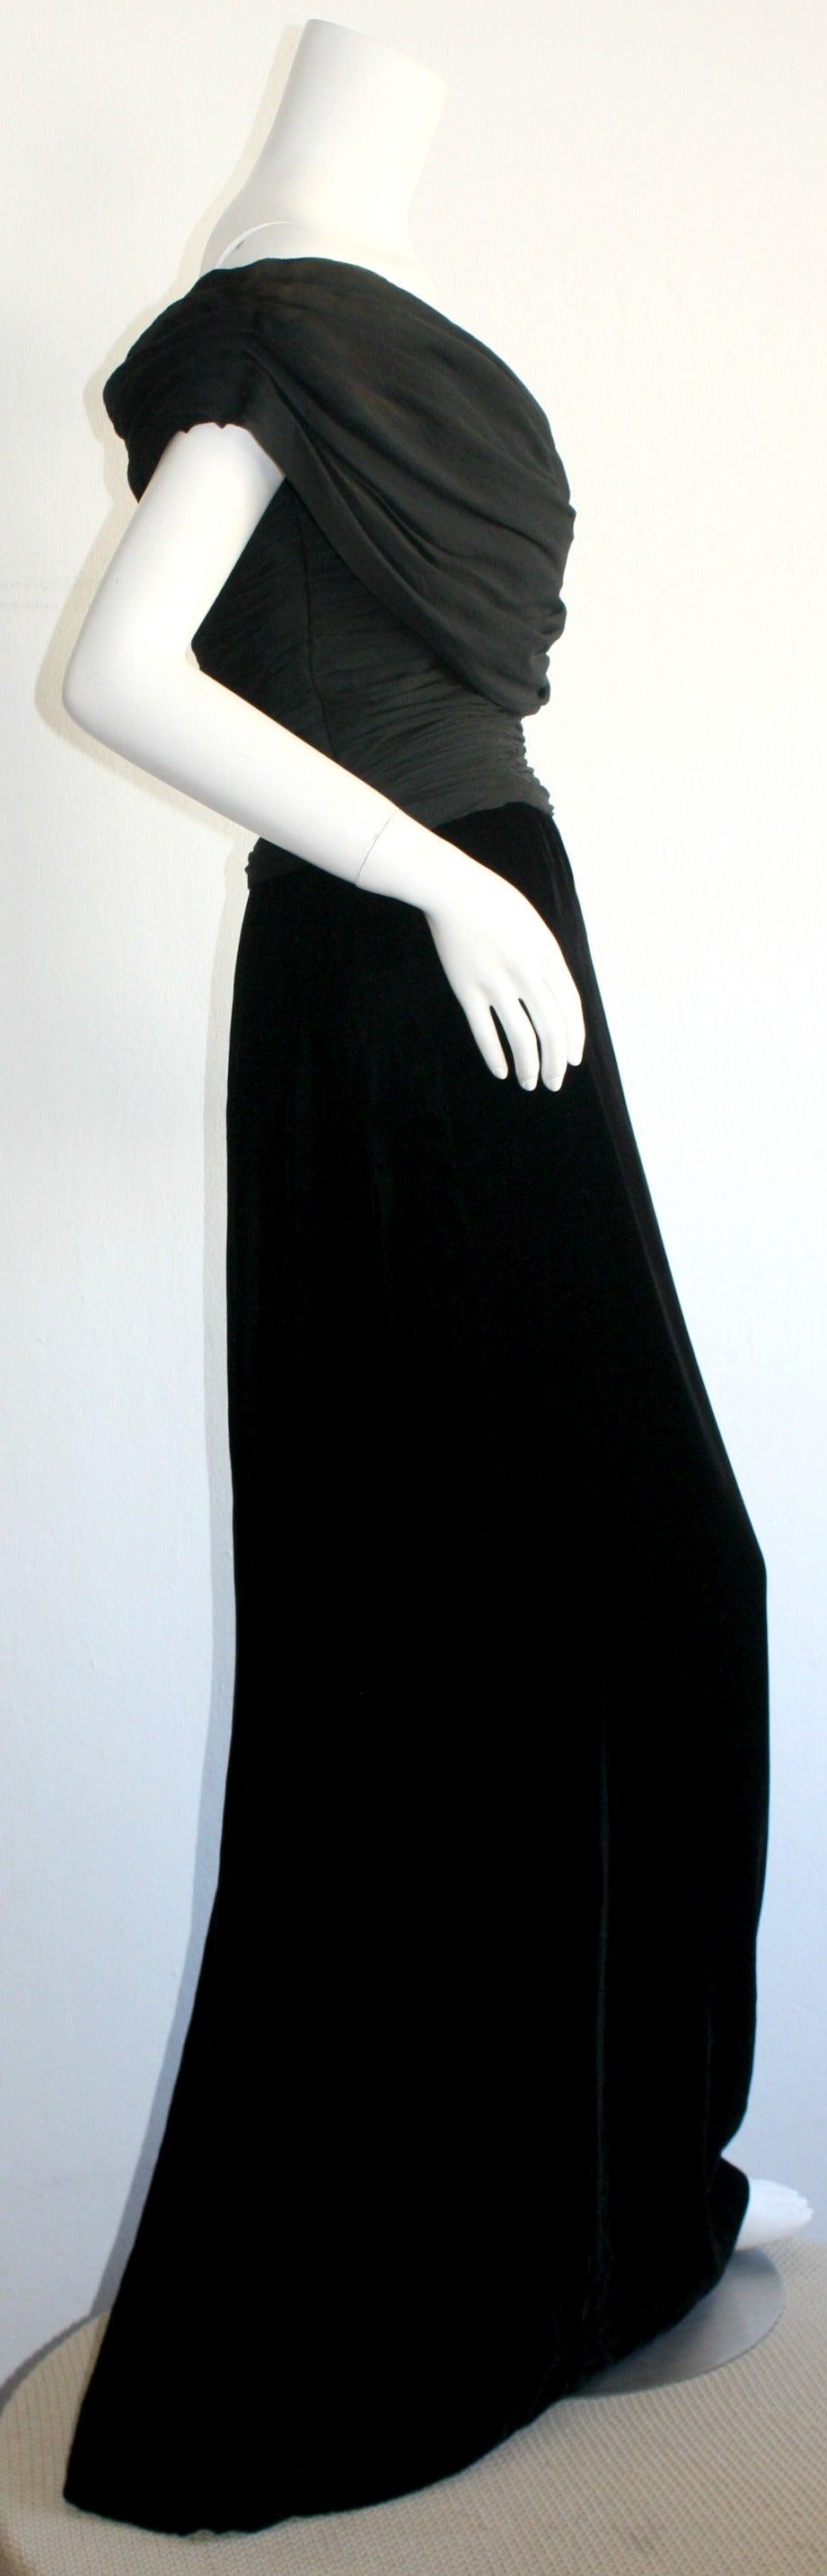 Remarkable Vintage Oscar de la Renta Black Velvet & Chiffon Grecian Gown 7